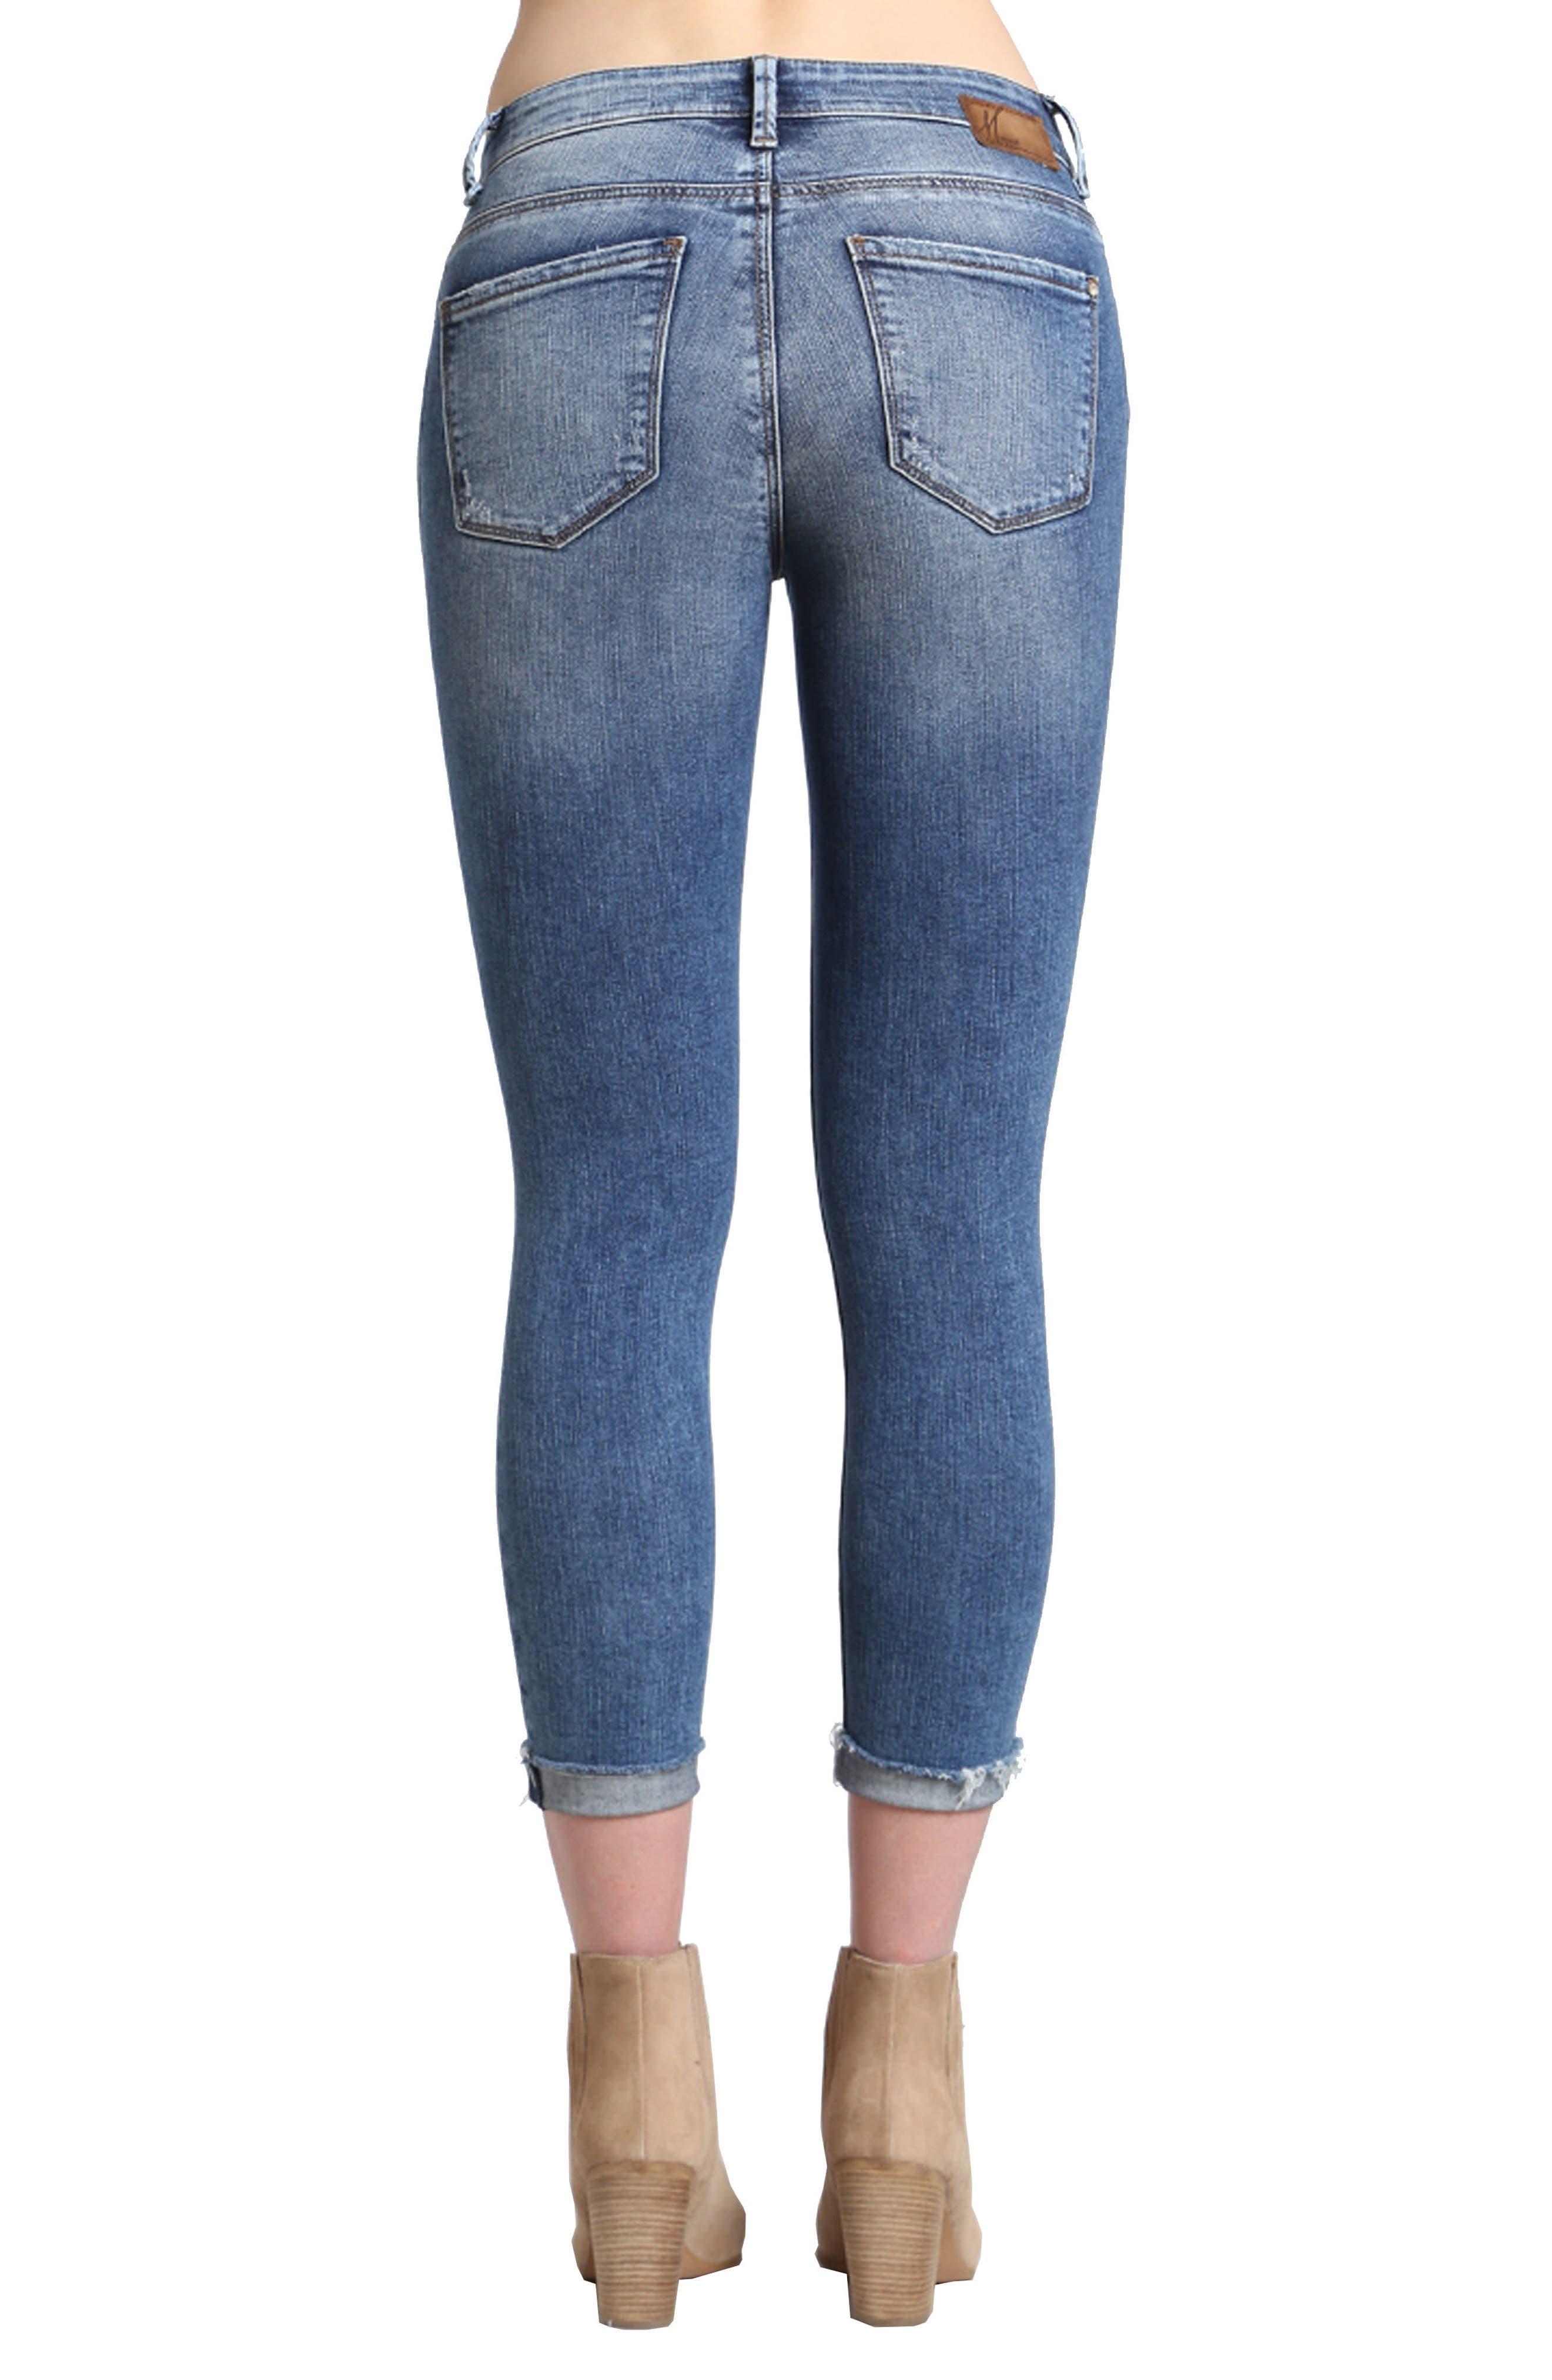 Tess Ripped Skinny Jeans,                             Alternate thumbnail 2, color,                             MID INDIGO VINTAGE